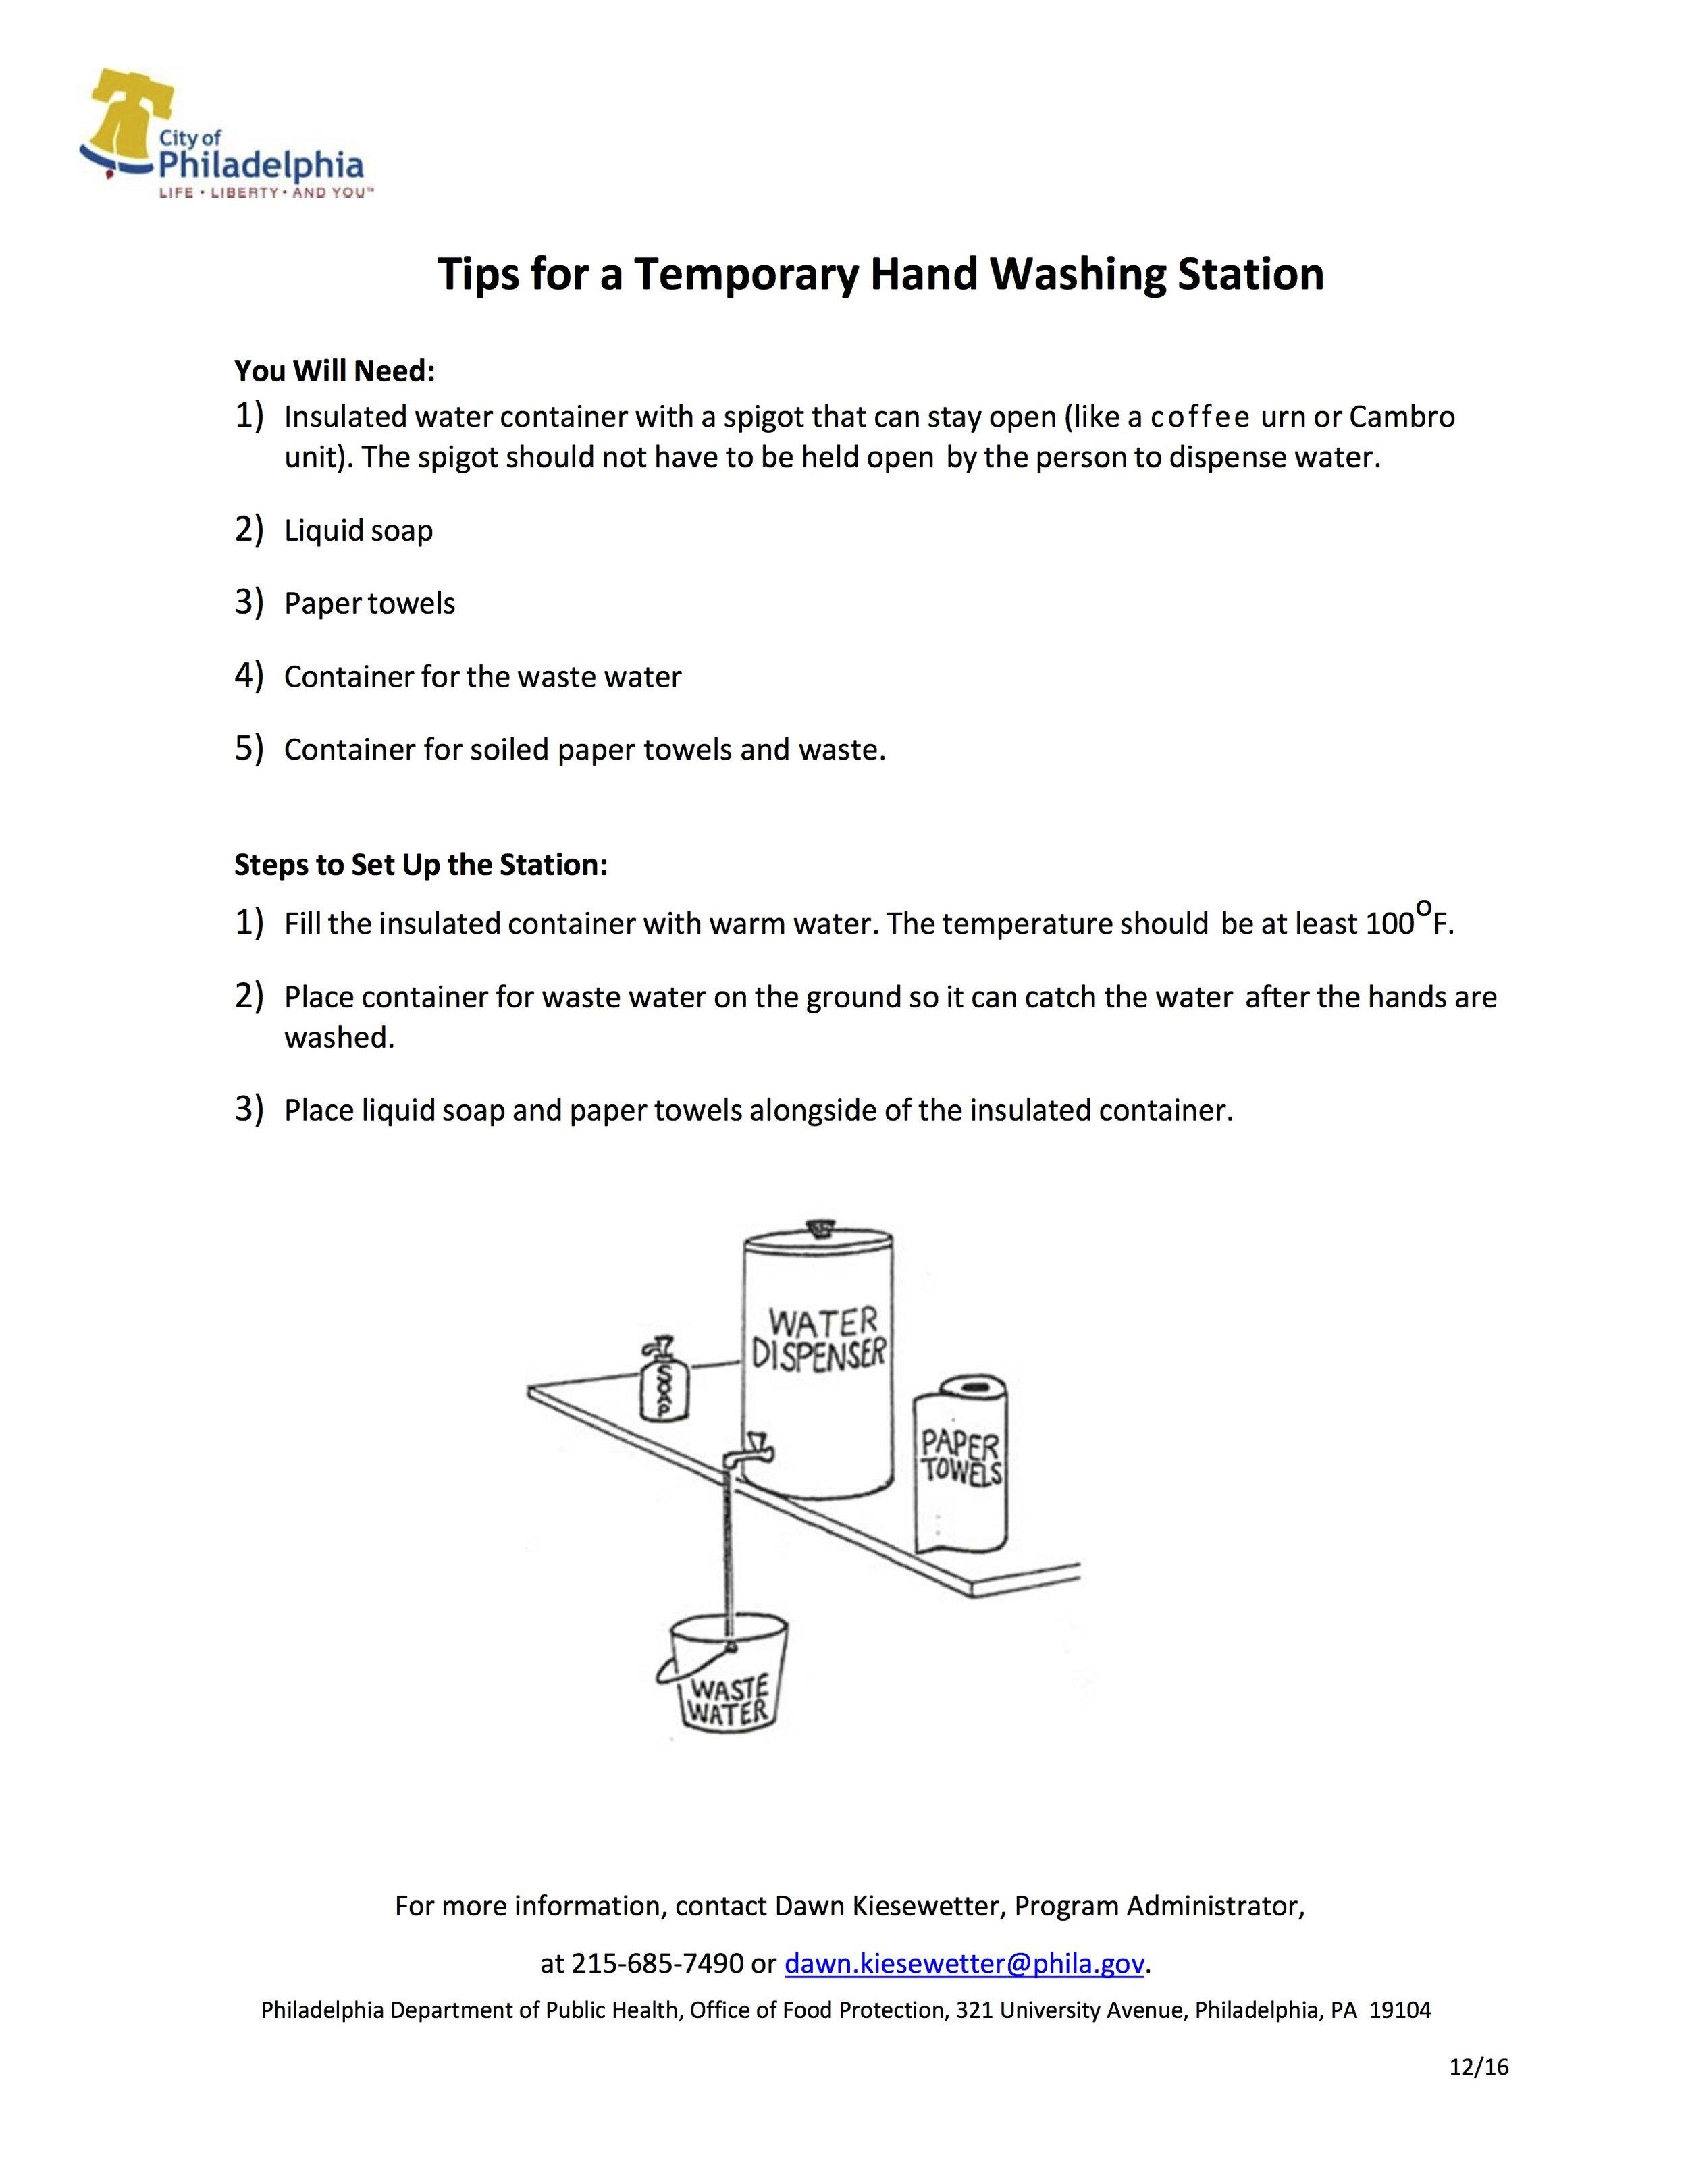 Hand_Washing_Station_2016_Revised.jpg